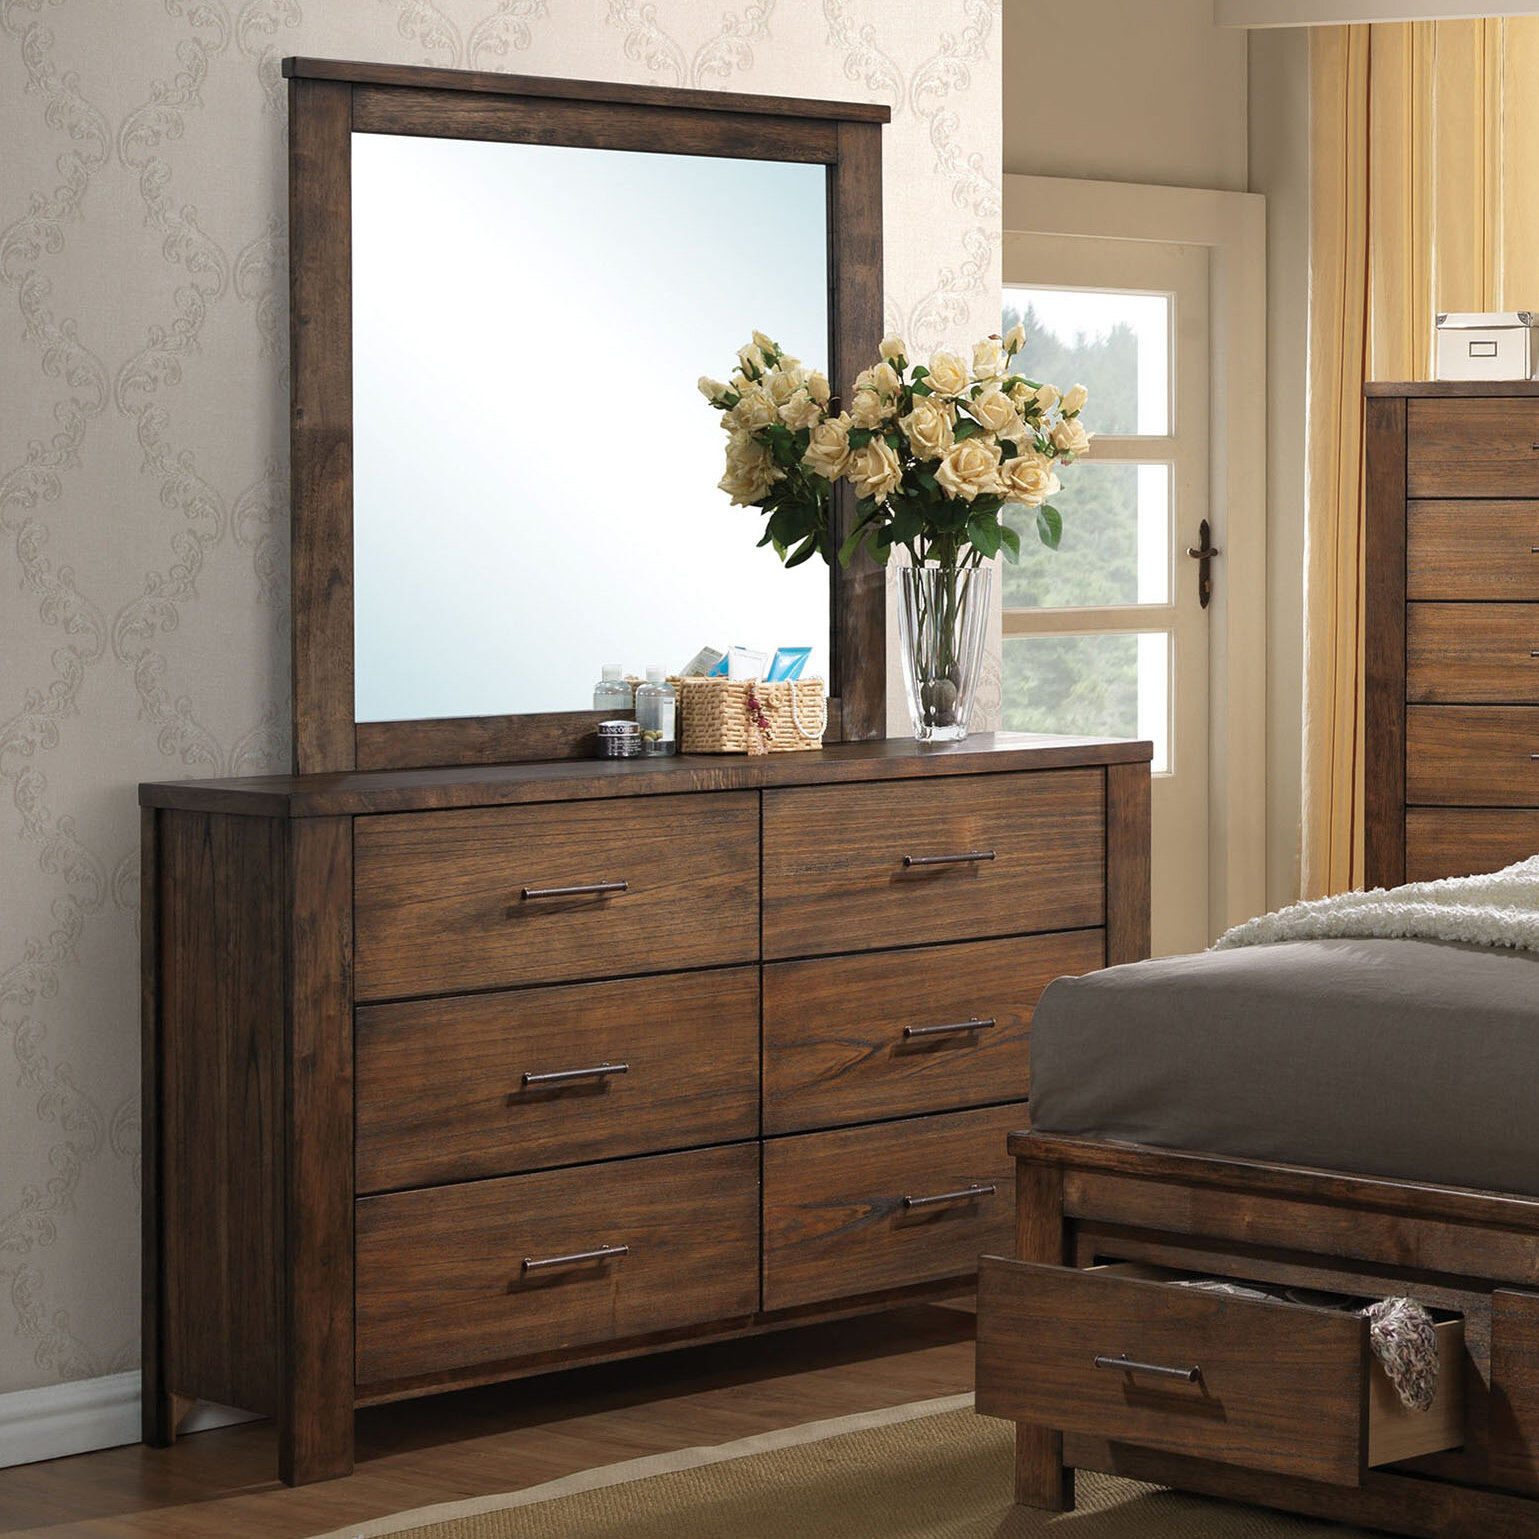 Latitude Run Schlesinger 6 Drawer Double Dresser With Mirror Reviews Wayfair